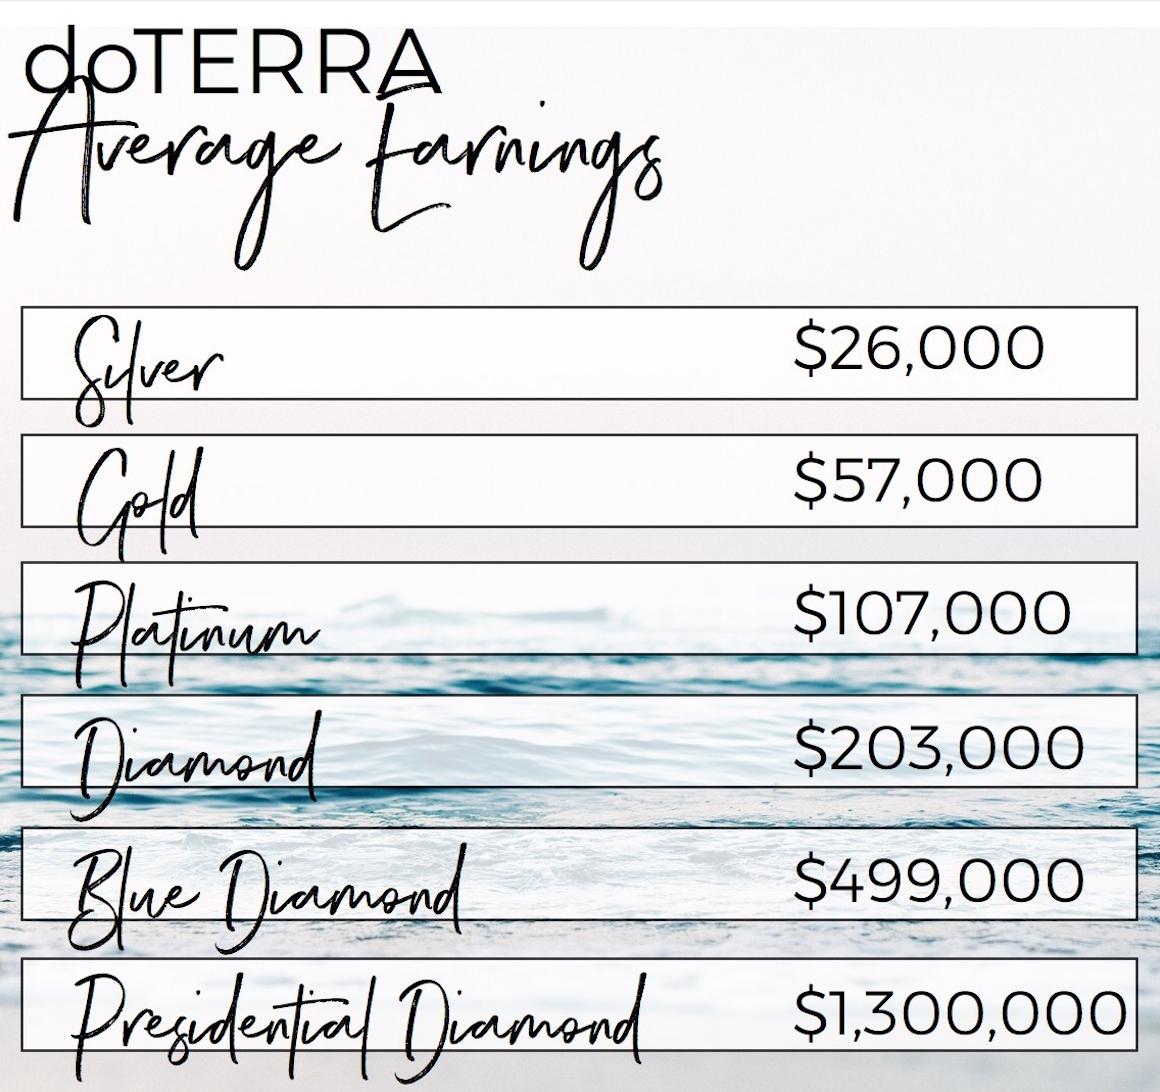 doTERRA+Average+Earnings.png